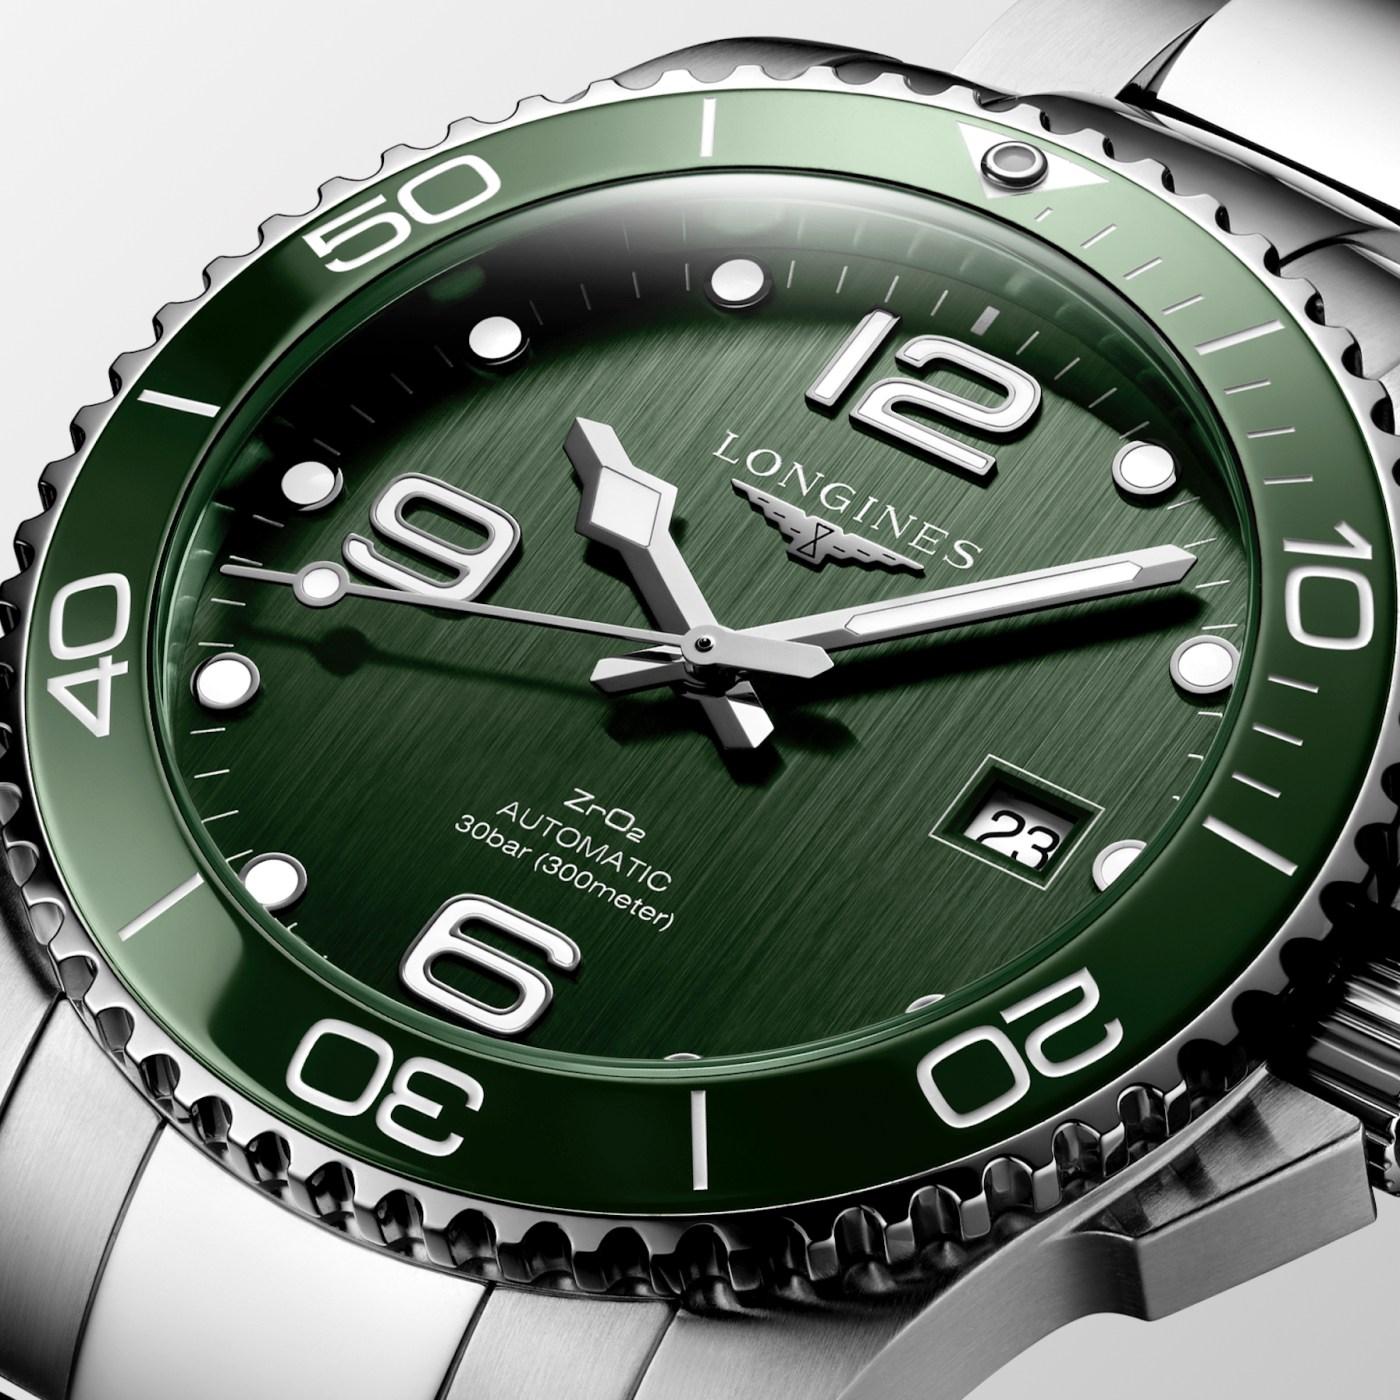 Longines HydroConquest Bright Green Ceramic dial close-up